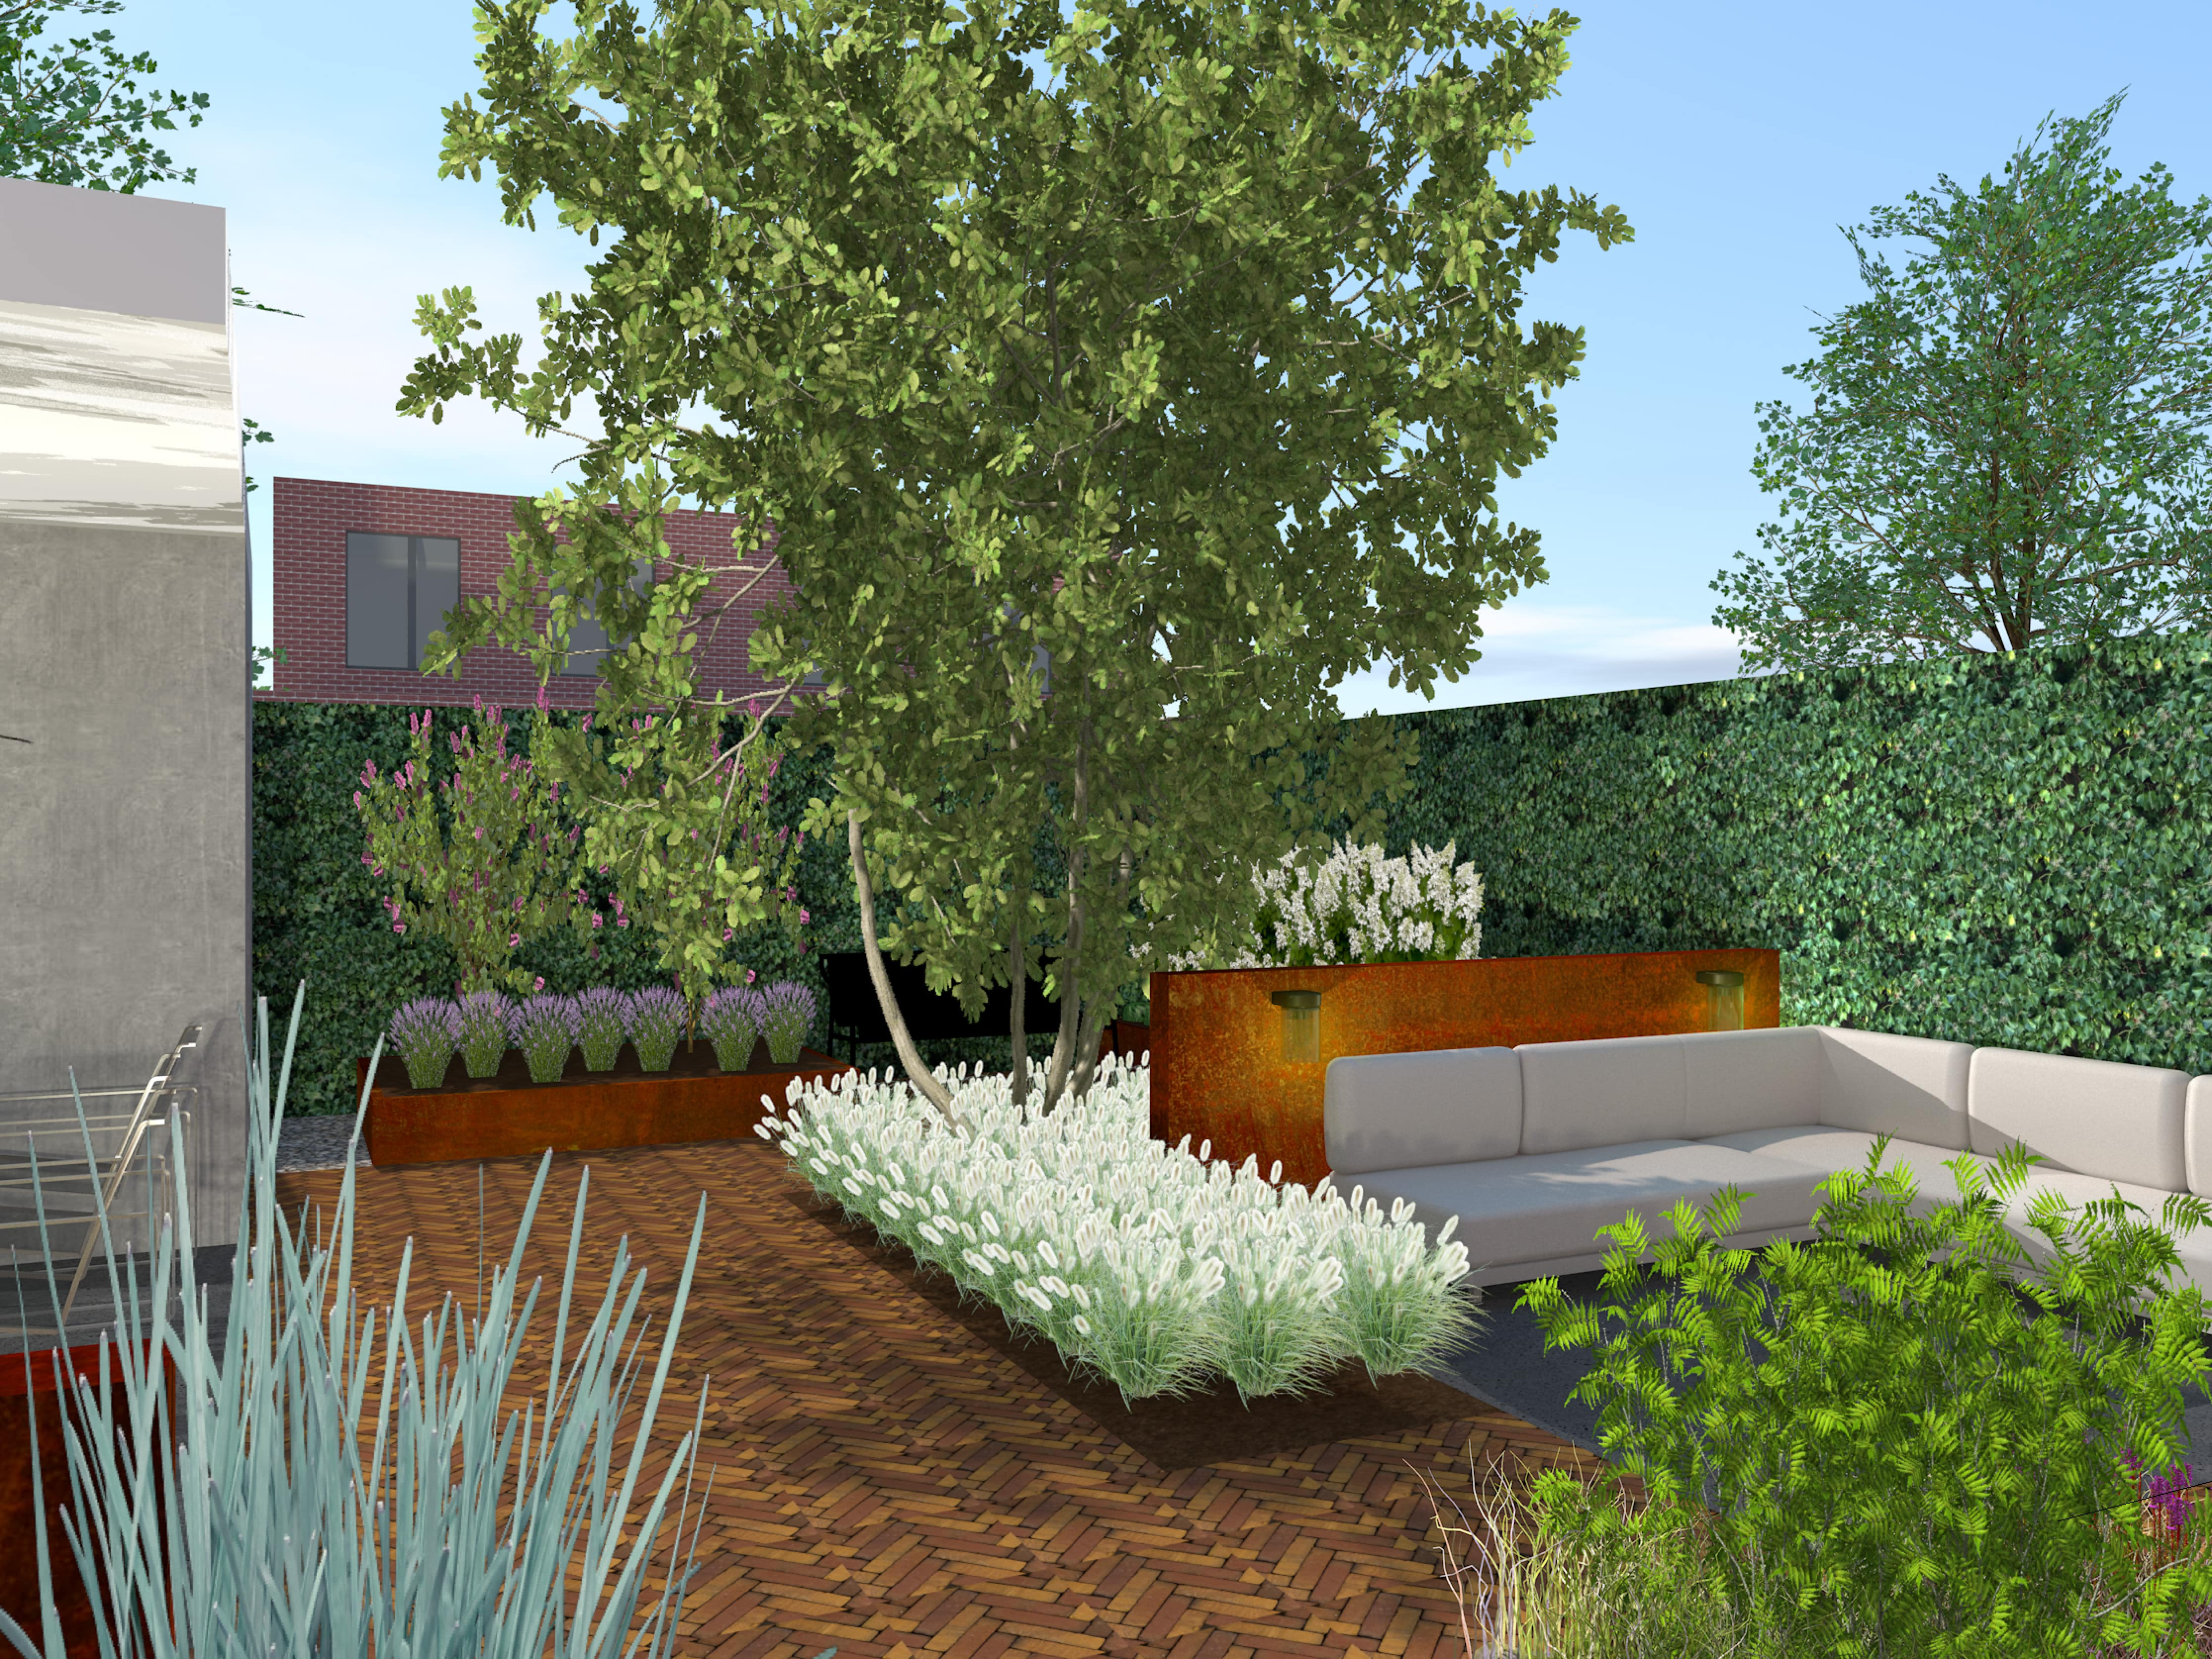 Tuinontwerp-3D-tuinontwerp-moderne-tuin-nijmegen-